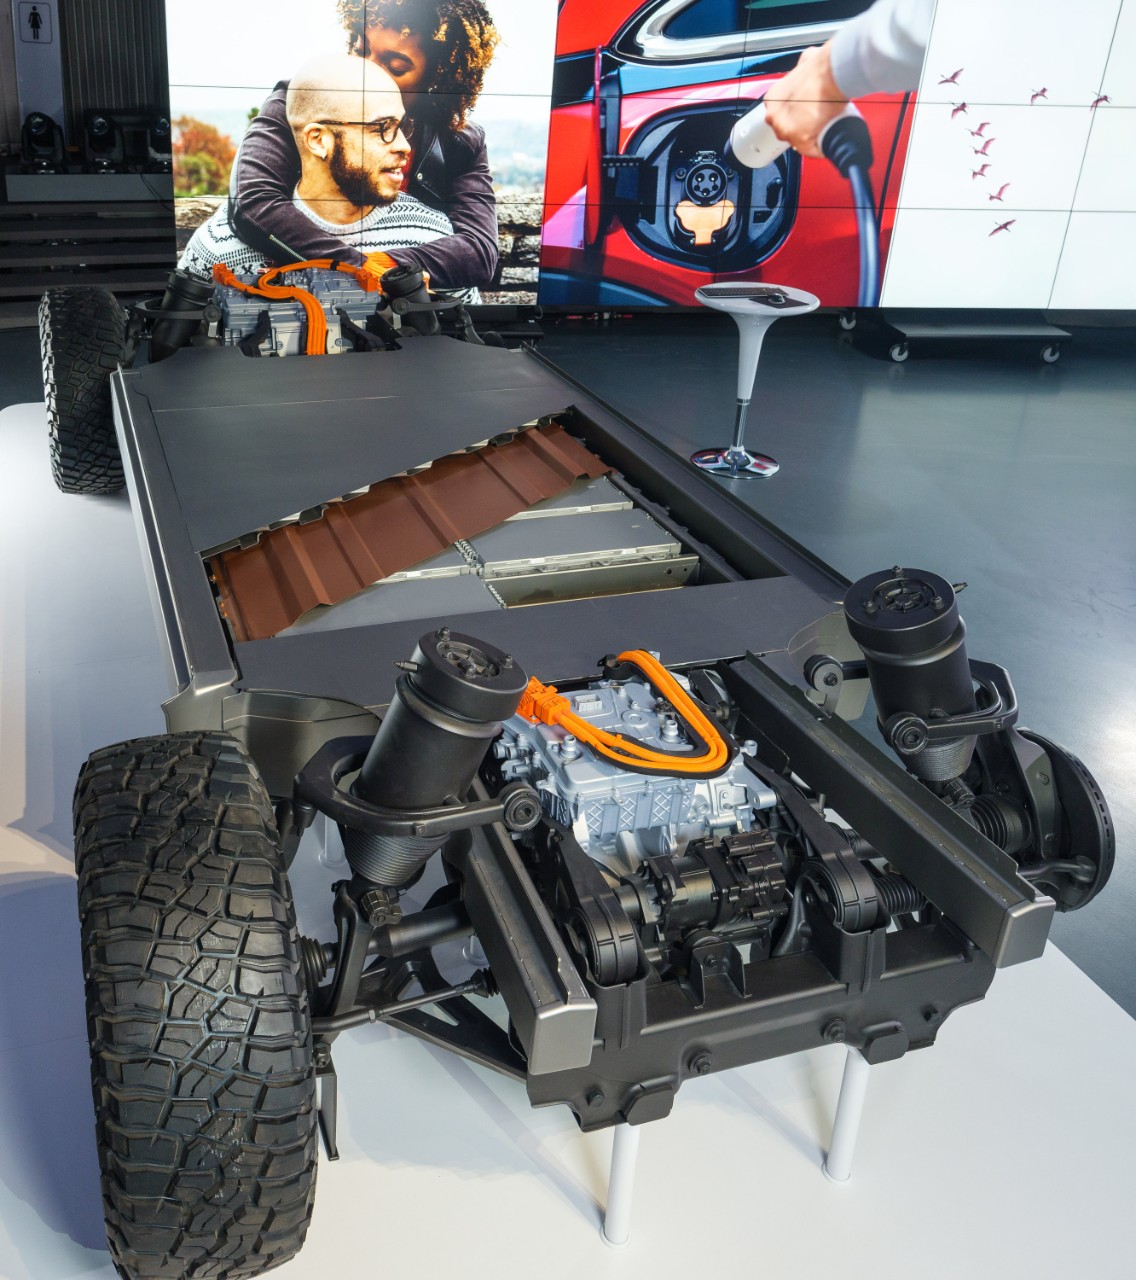 Report: GM adds electric van to its upcoming EV fleet in a bid to rival Tesla 1